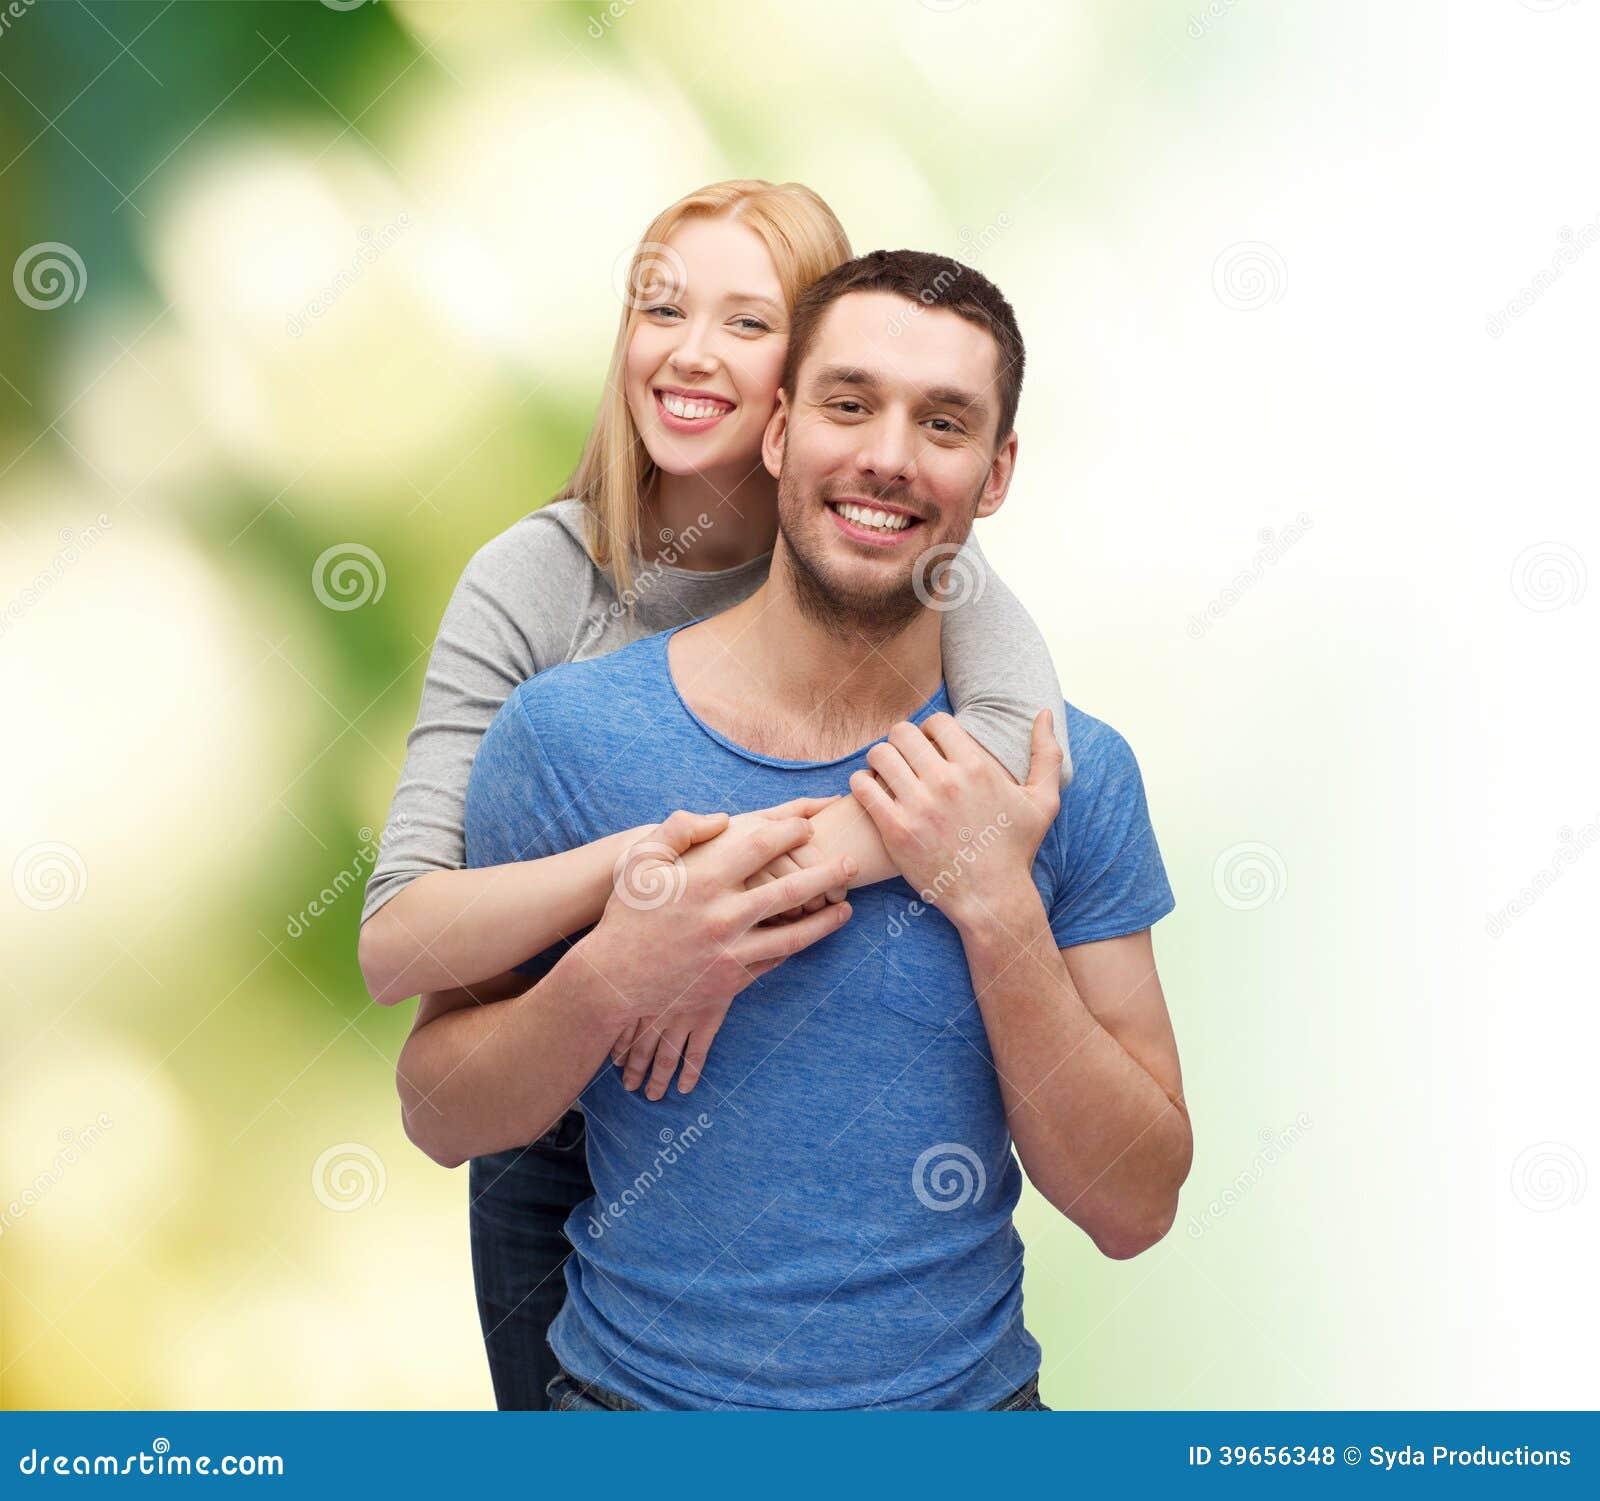 Smiling Couple Hugging Stock Photo. Image Of Joyful, Adult